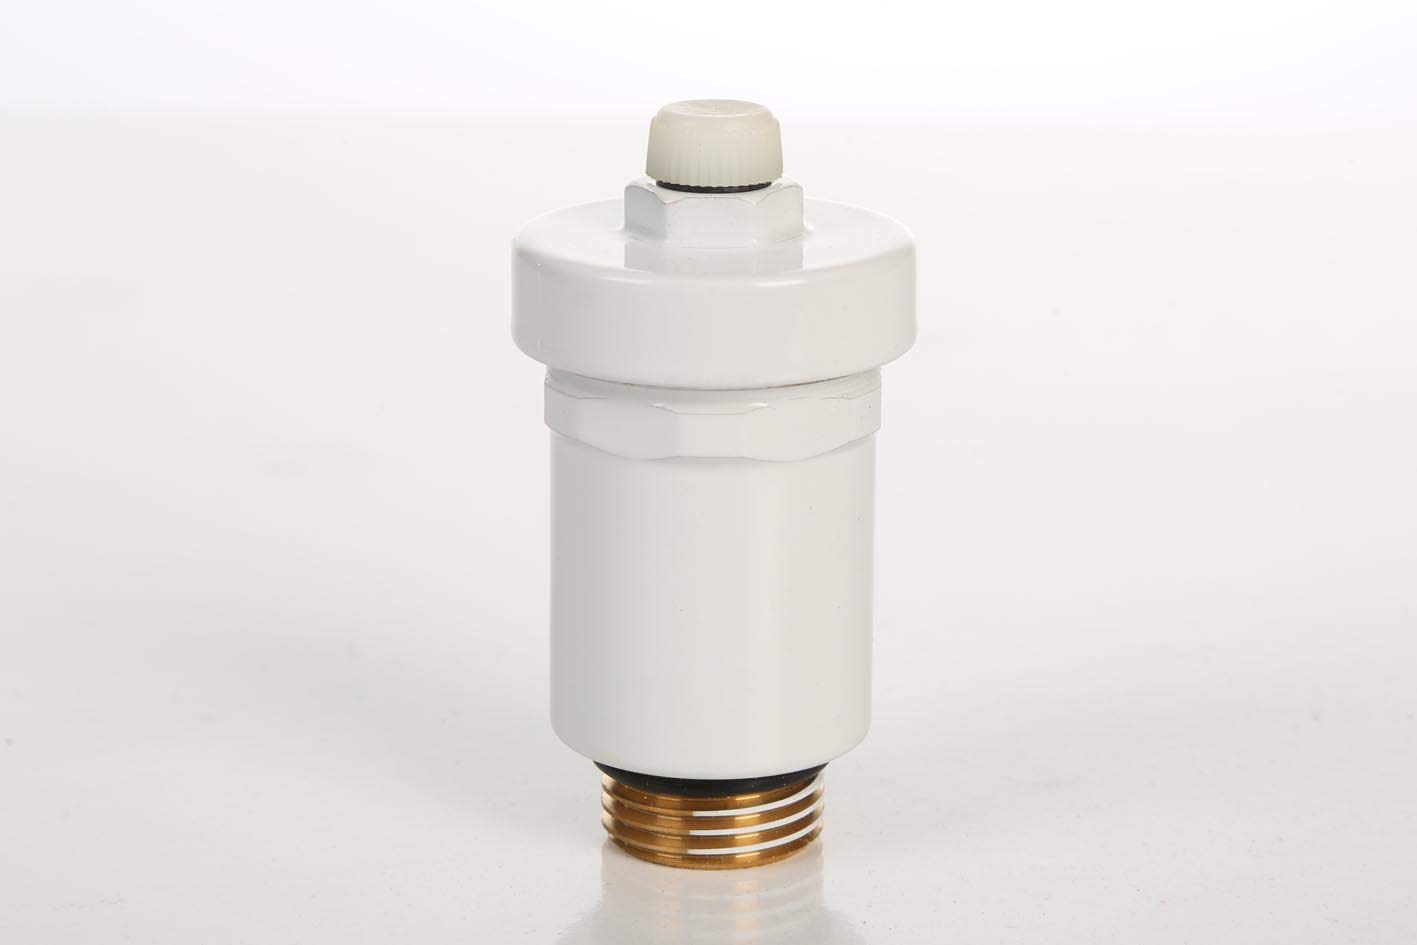 1//2 V/álvula de purga r/ápida autom/ática dise/ño blanco